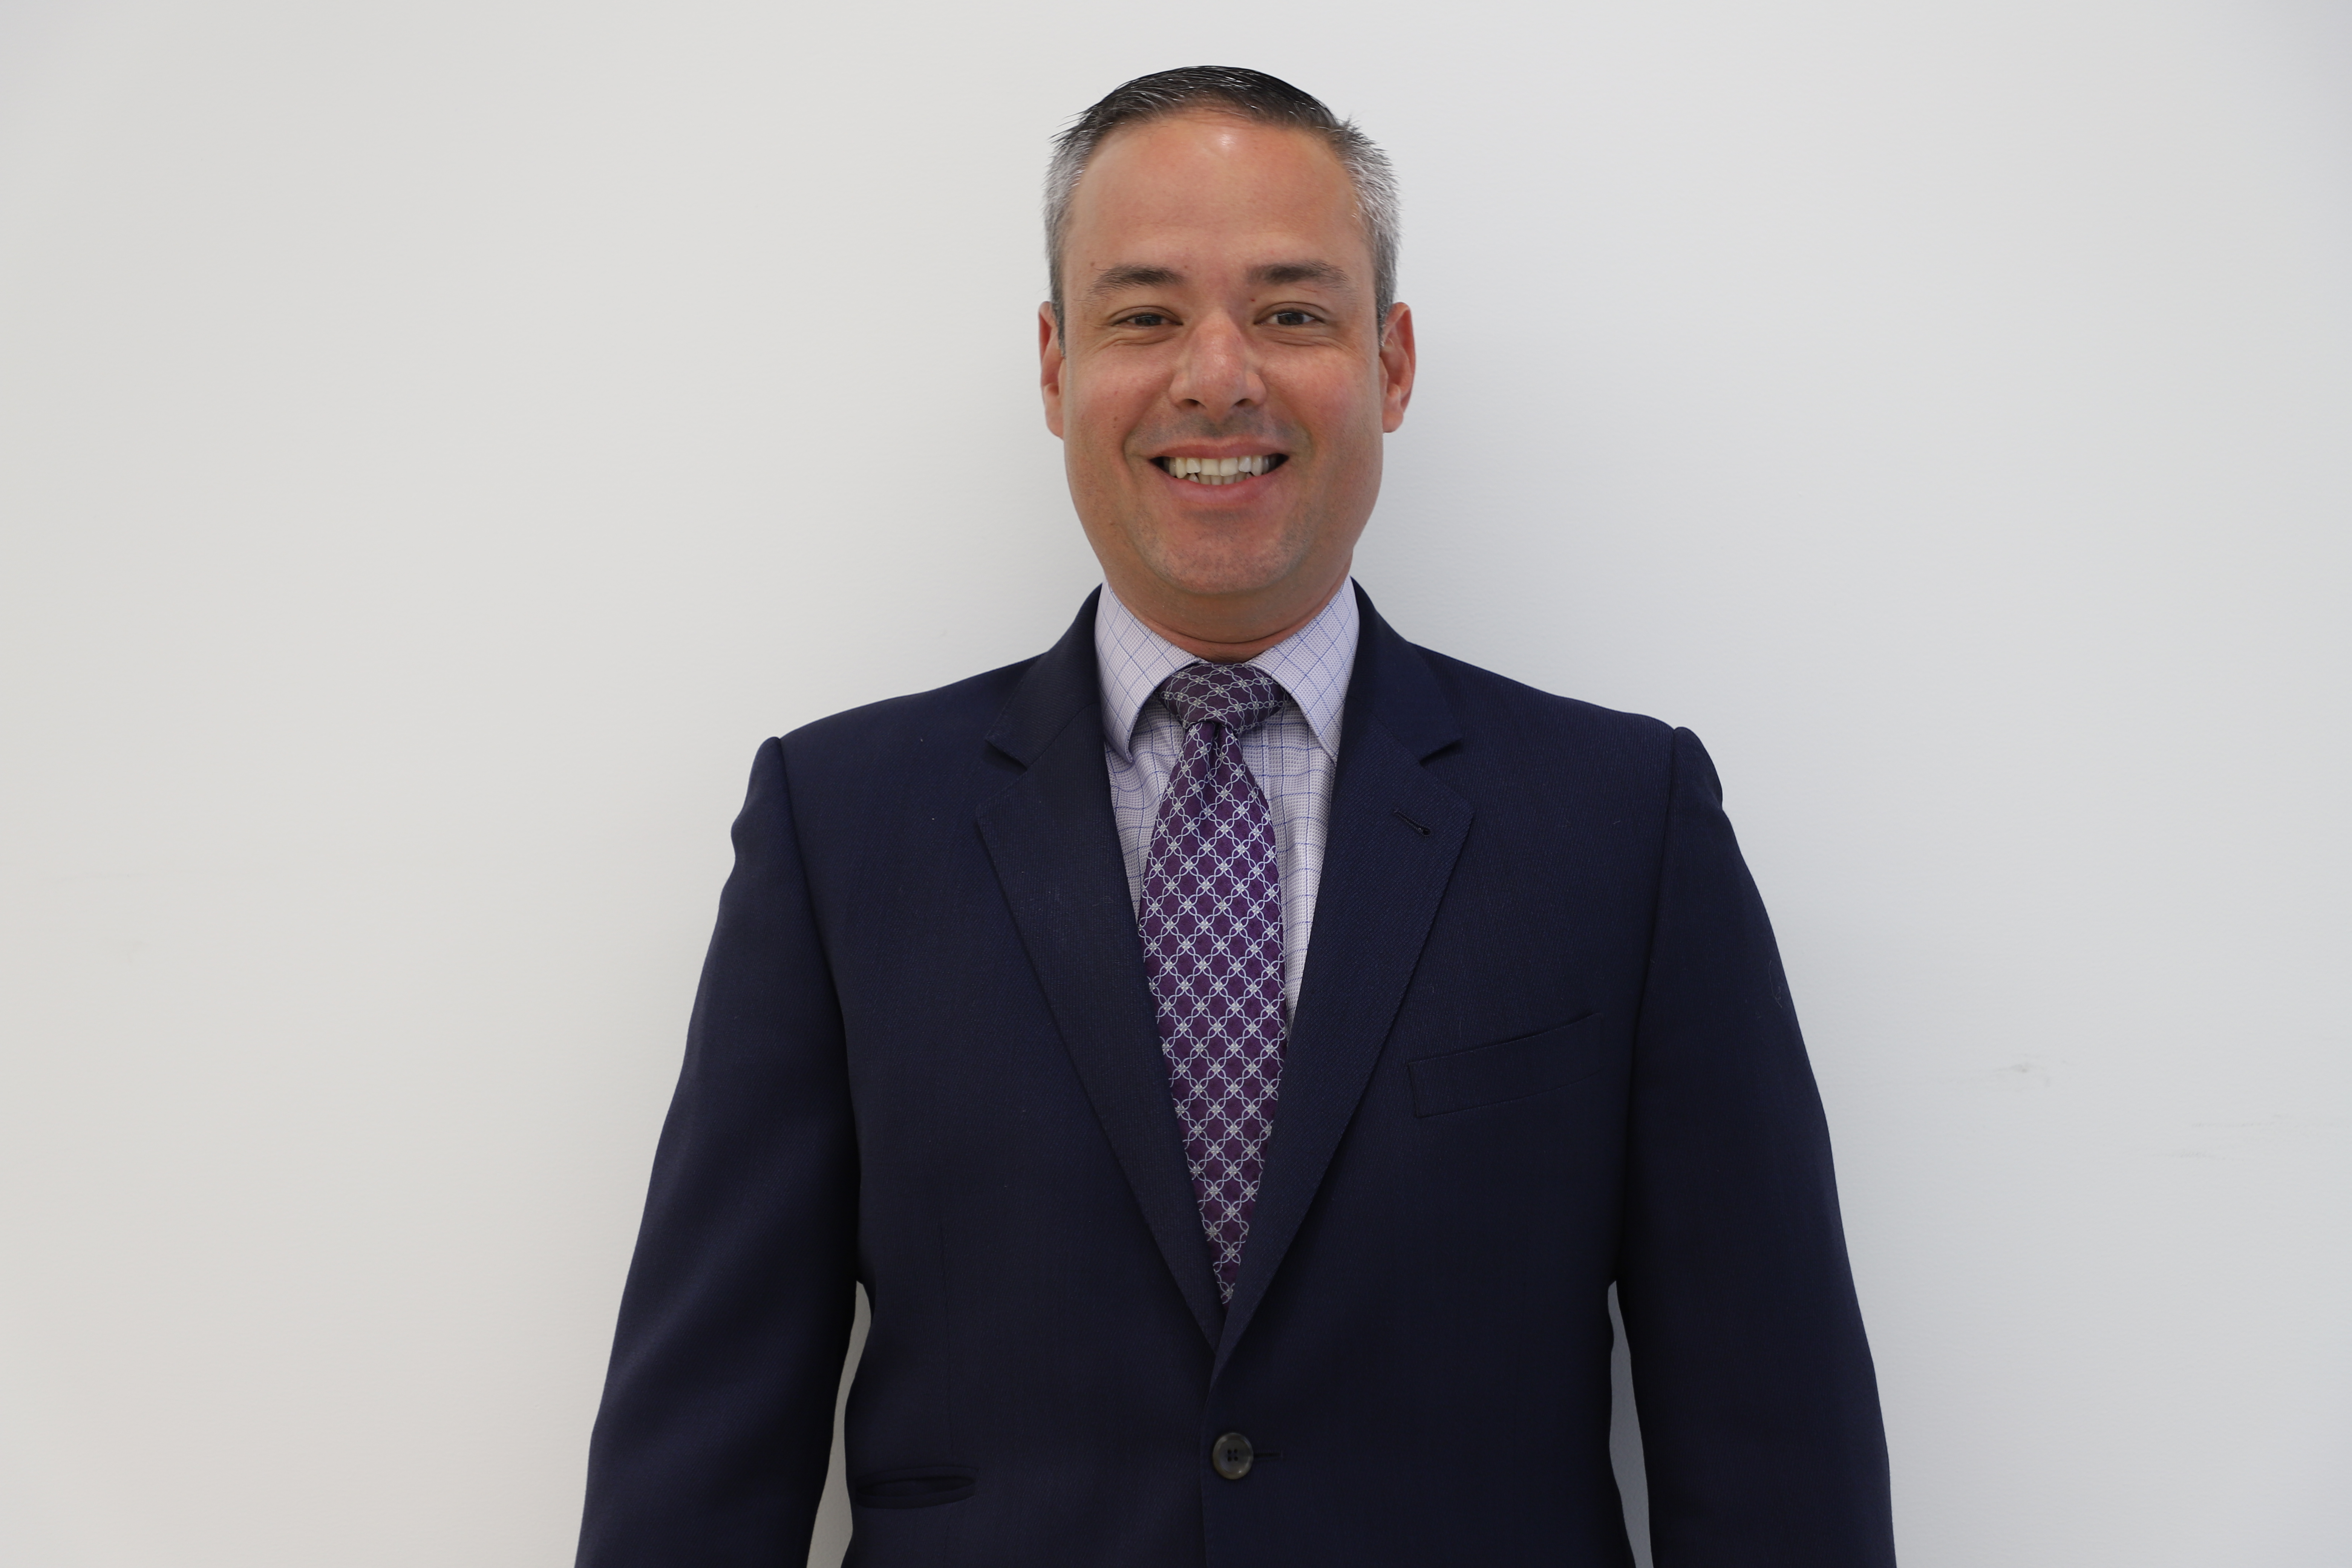 Daniel Mota - Pre-Owned Manager